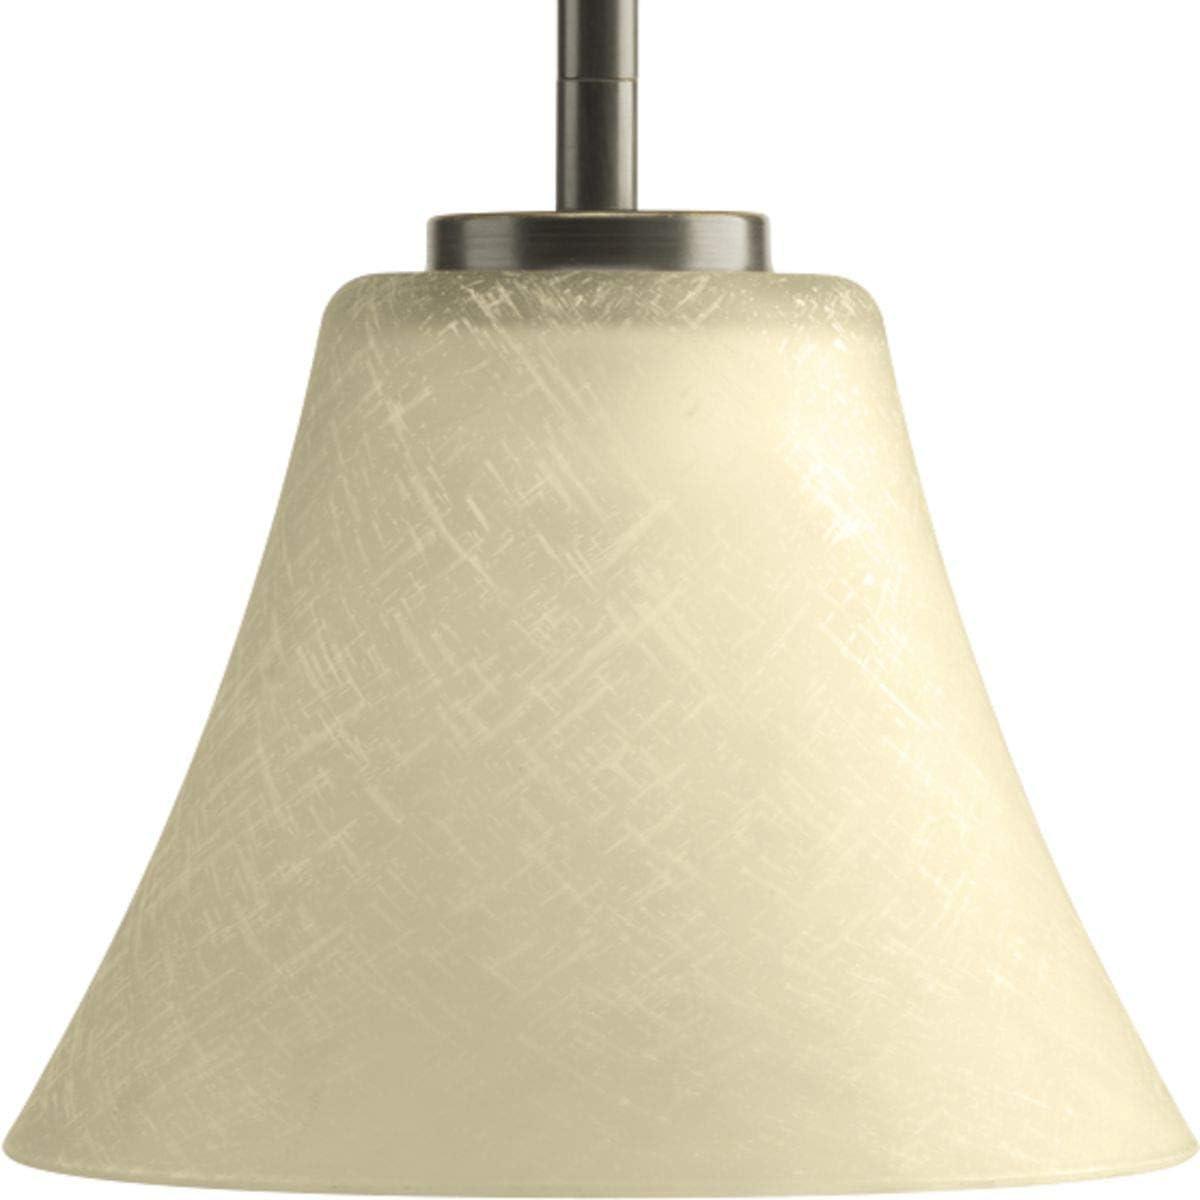 Progress Lighting P5300-20 Bravo Collection 1-Light Mini-Pendant, Antique Bronze